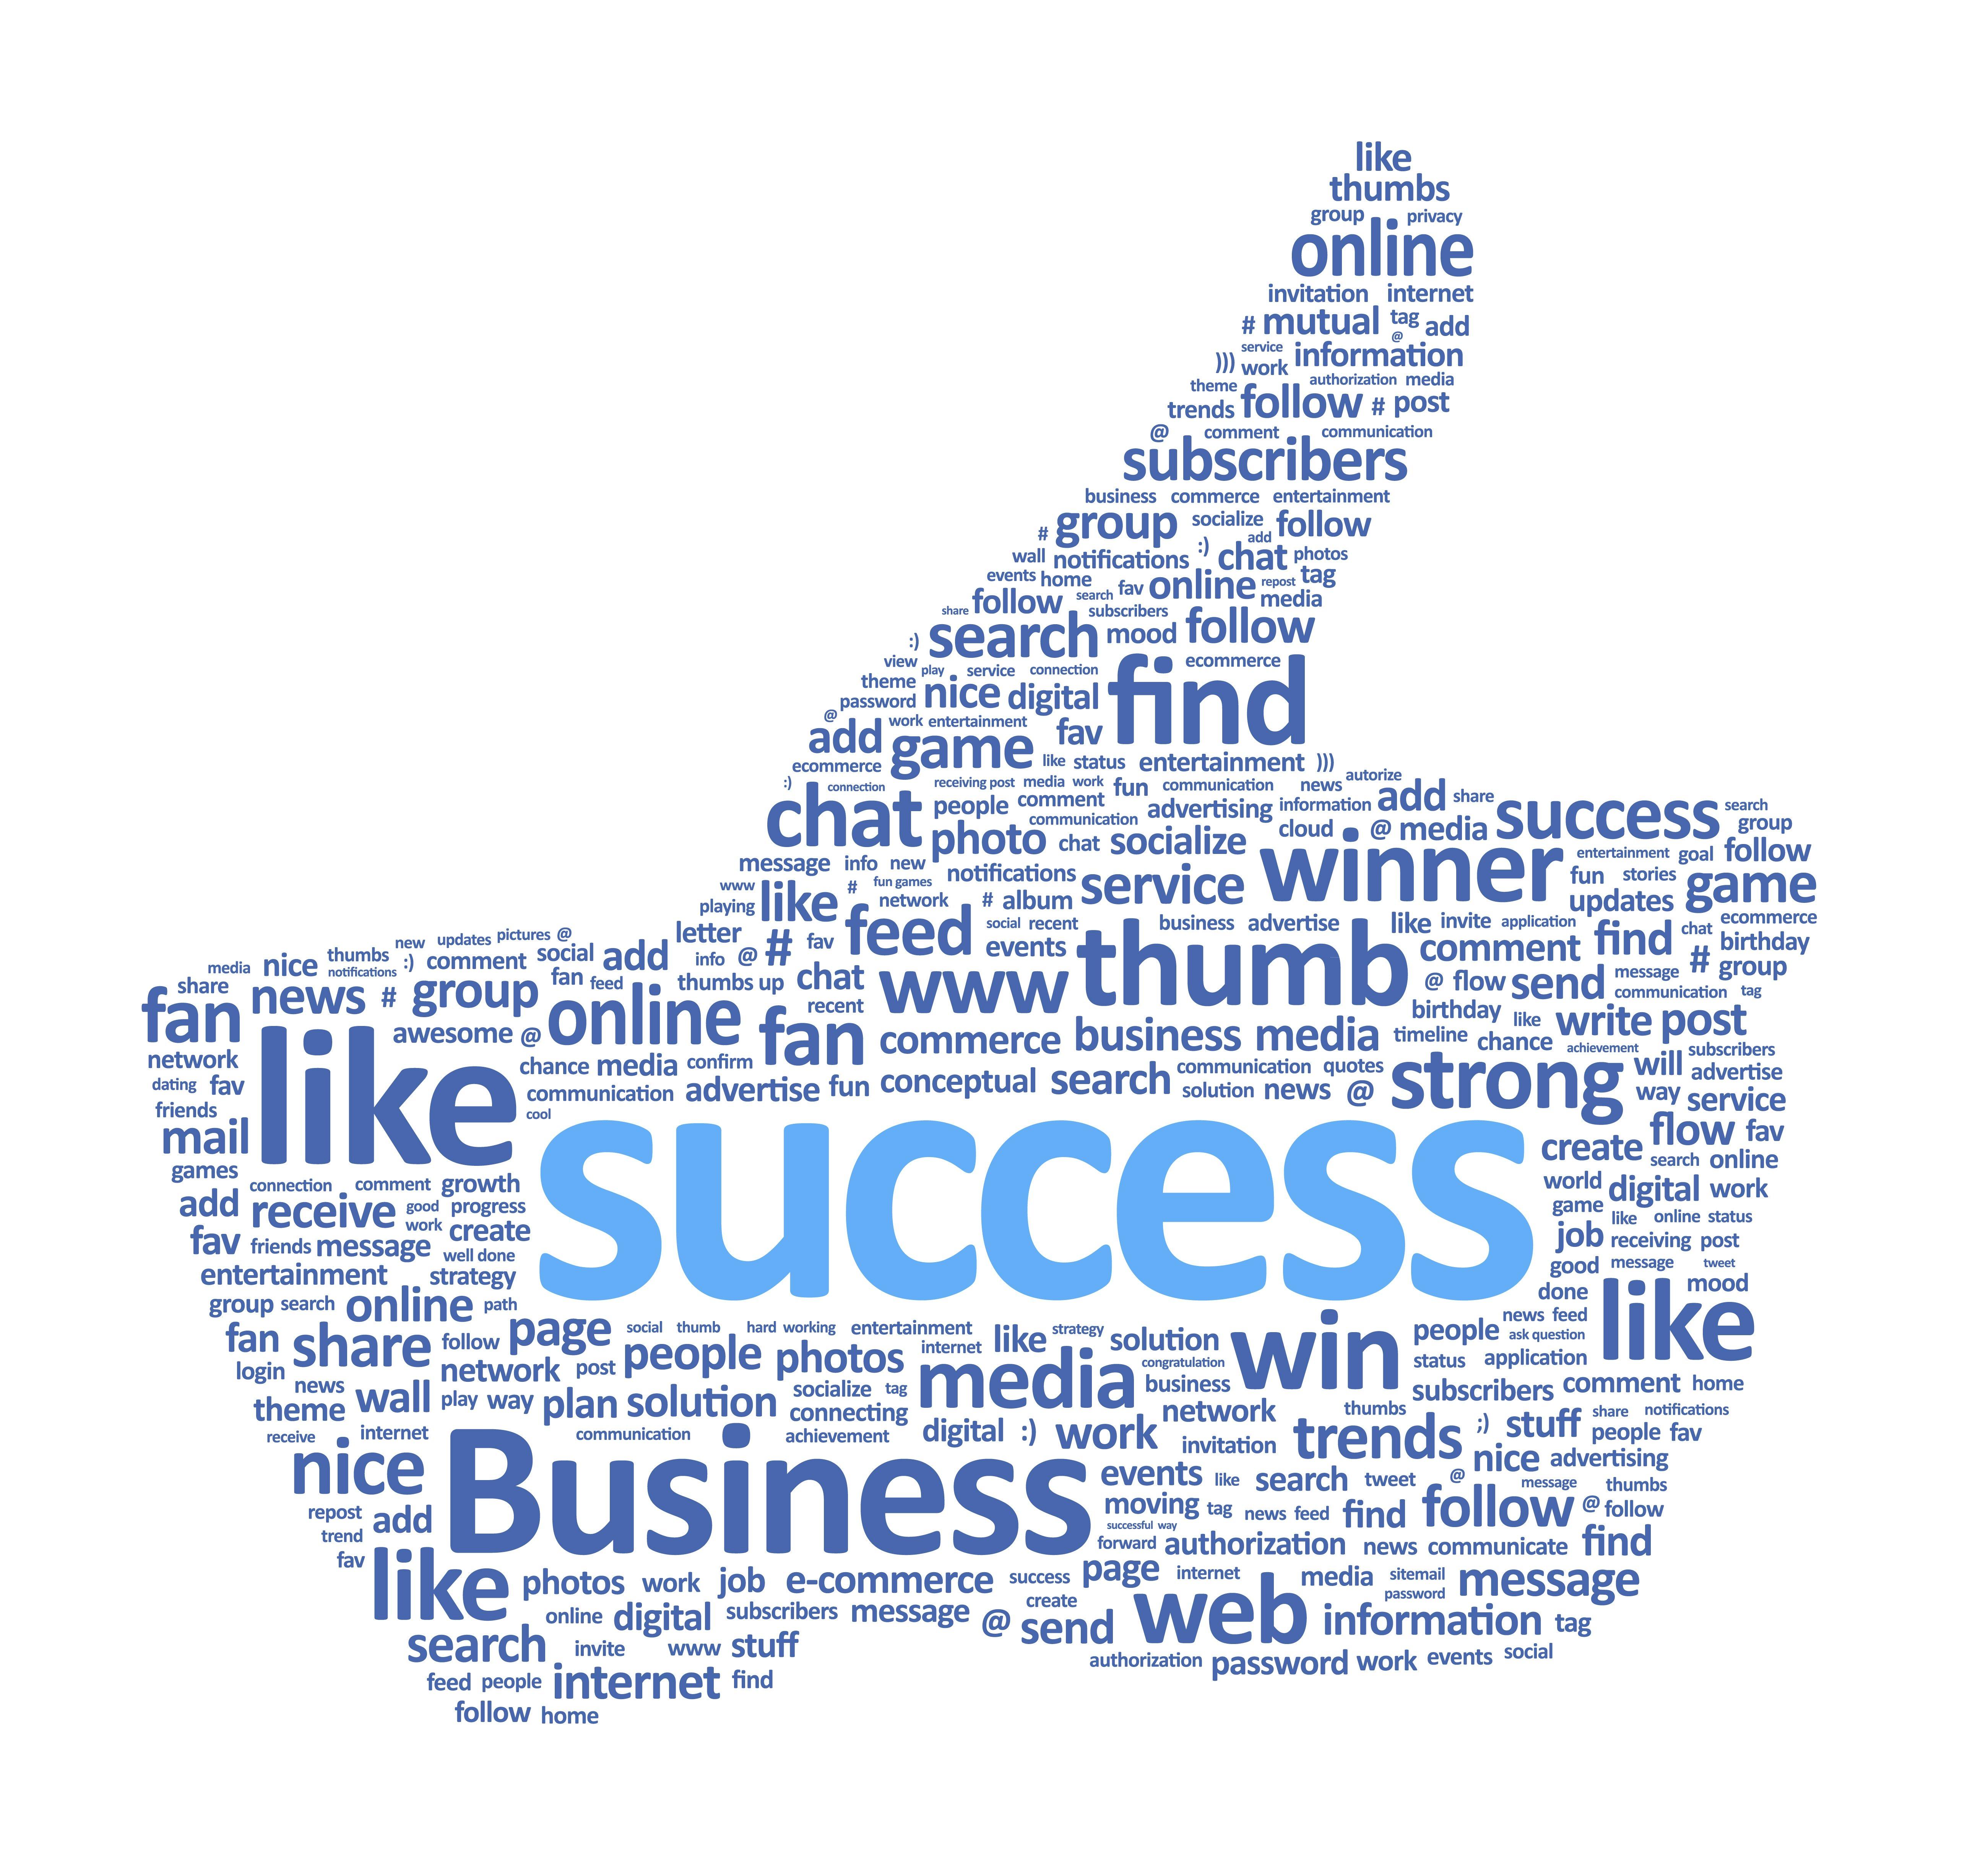 core success characteristics